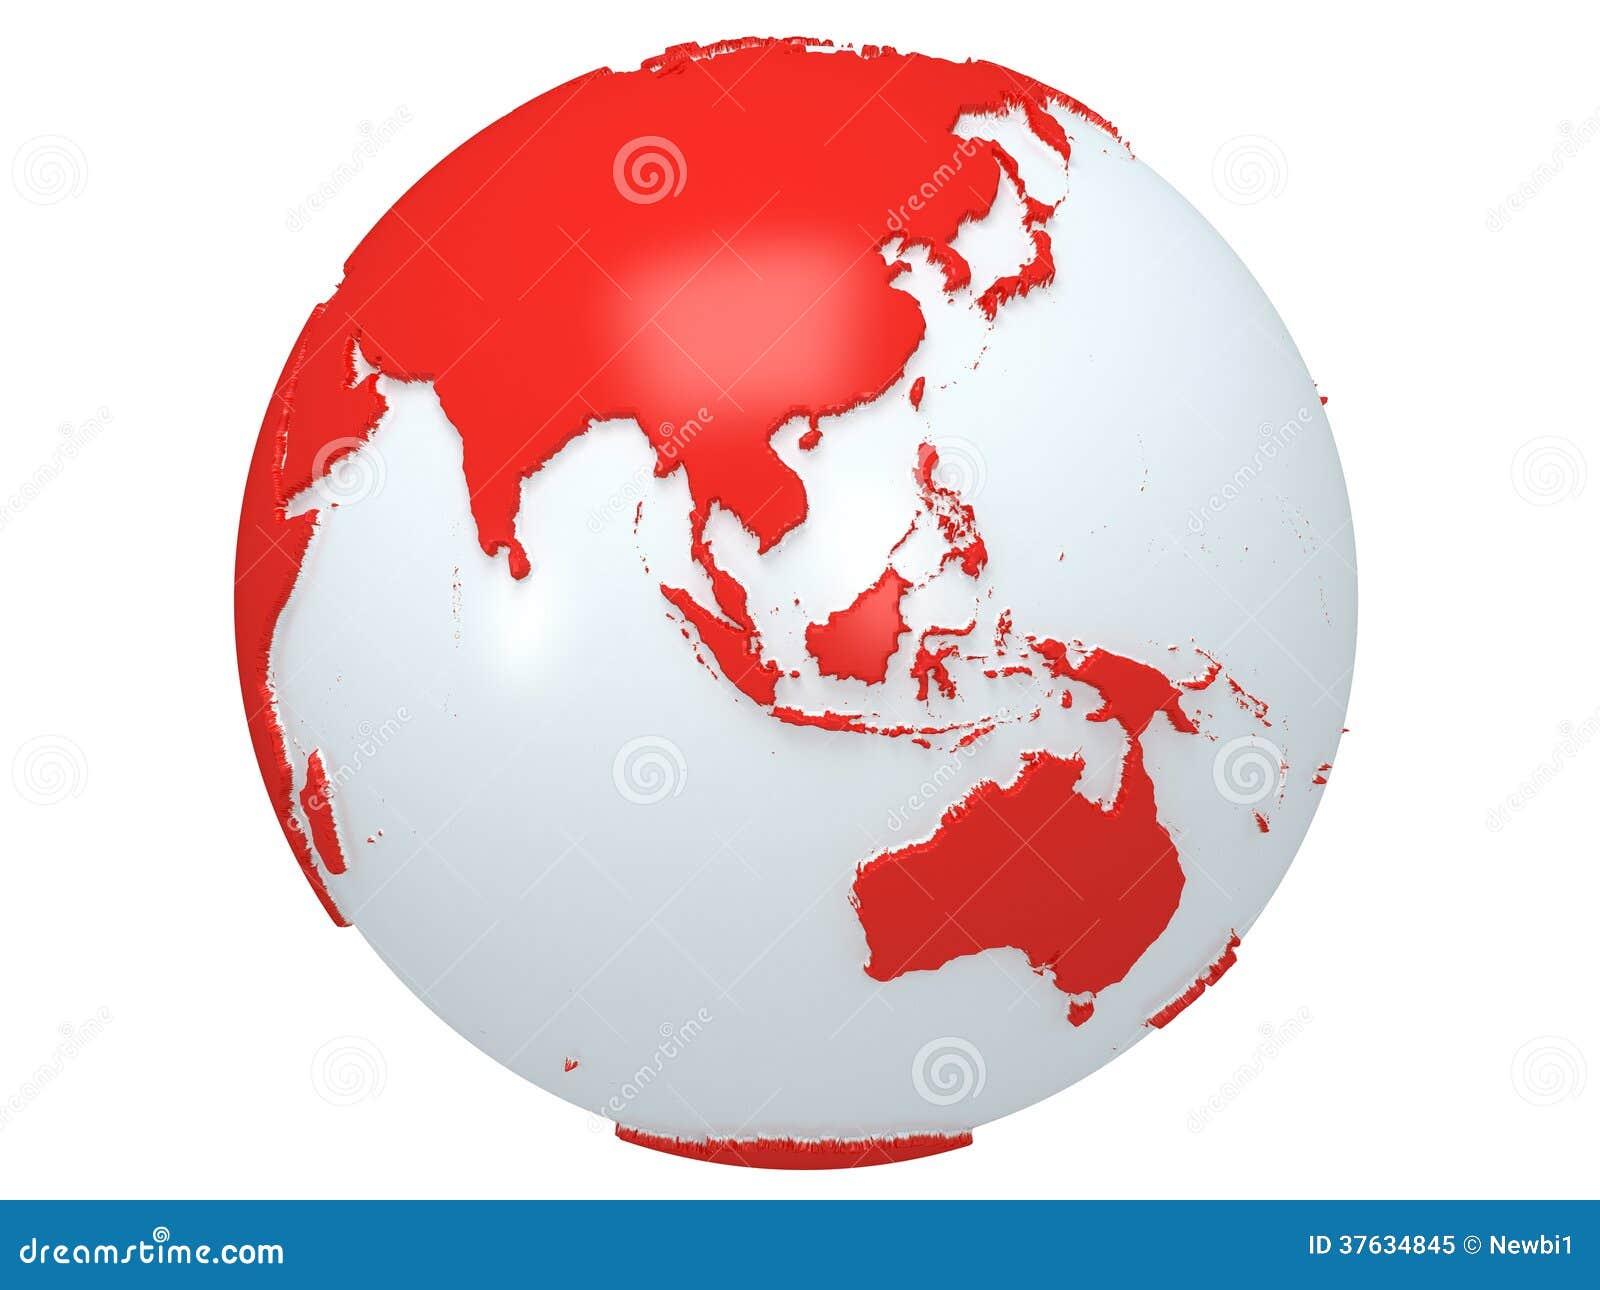 world map equator africa